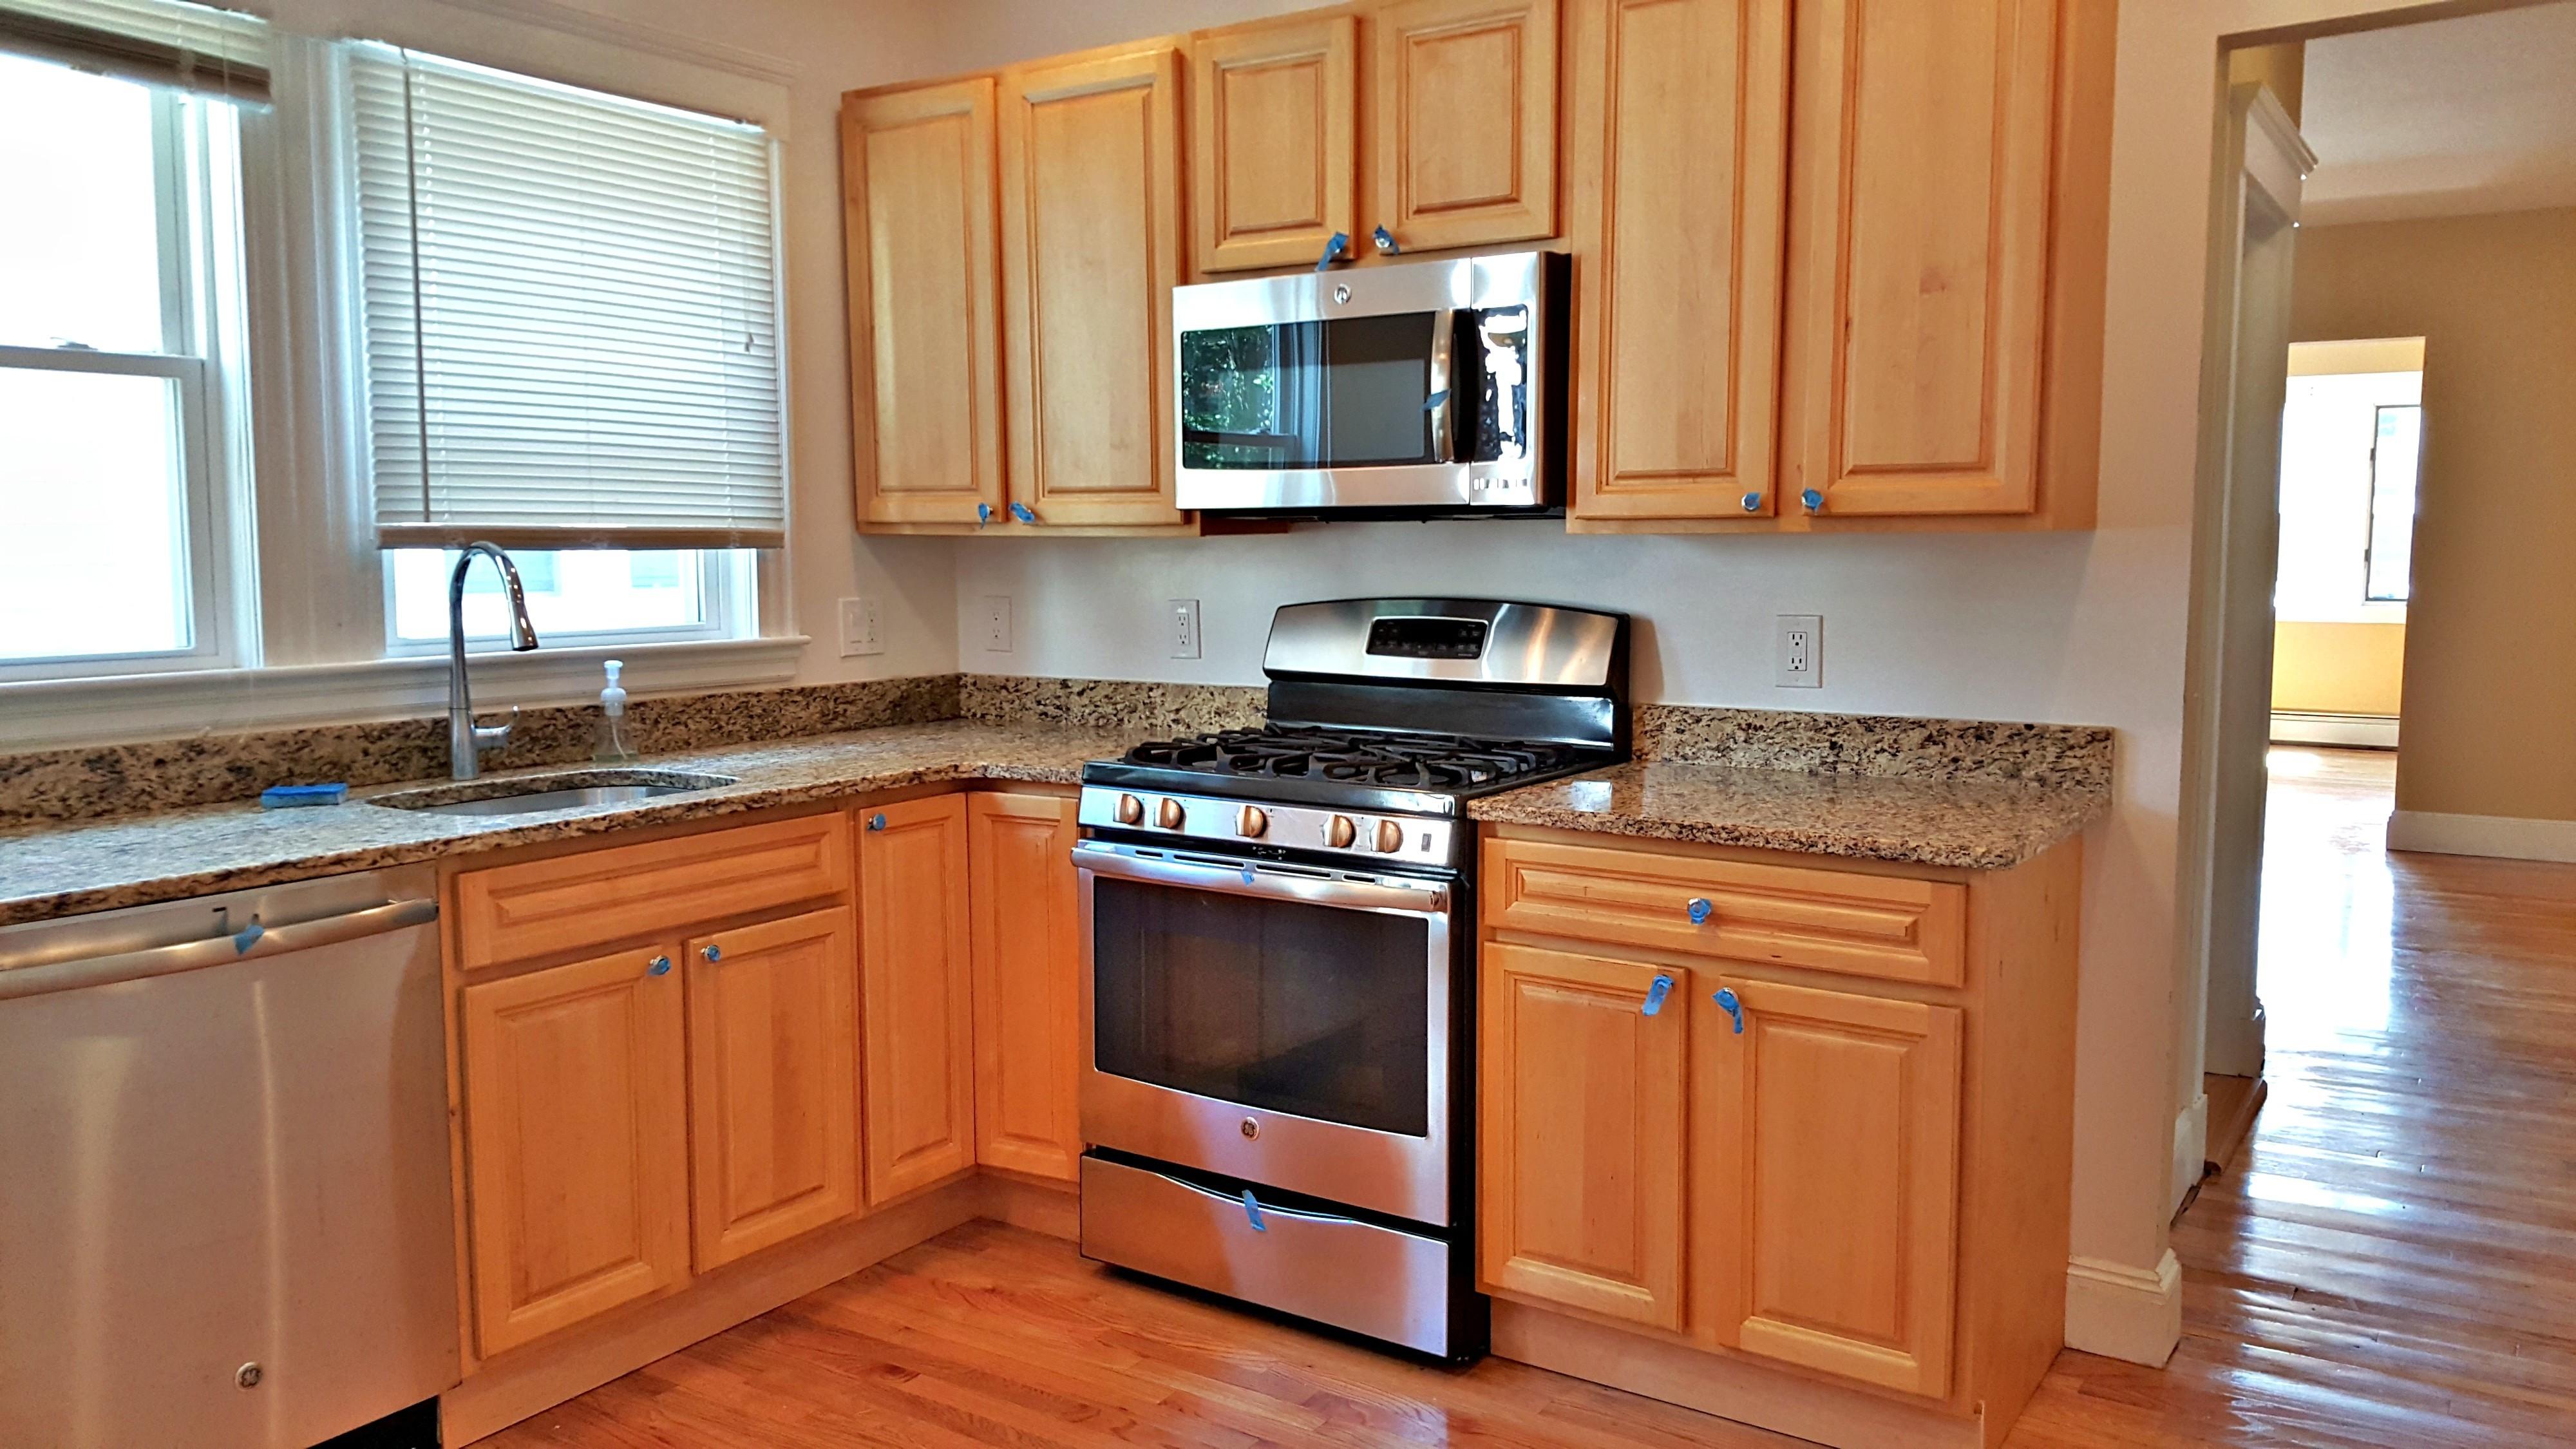 Auburn St, Medford, MA 02155  2 Bedroom Apartment for Rent